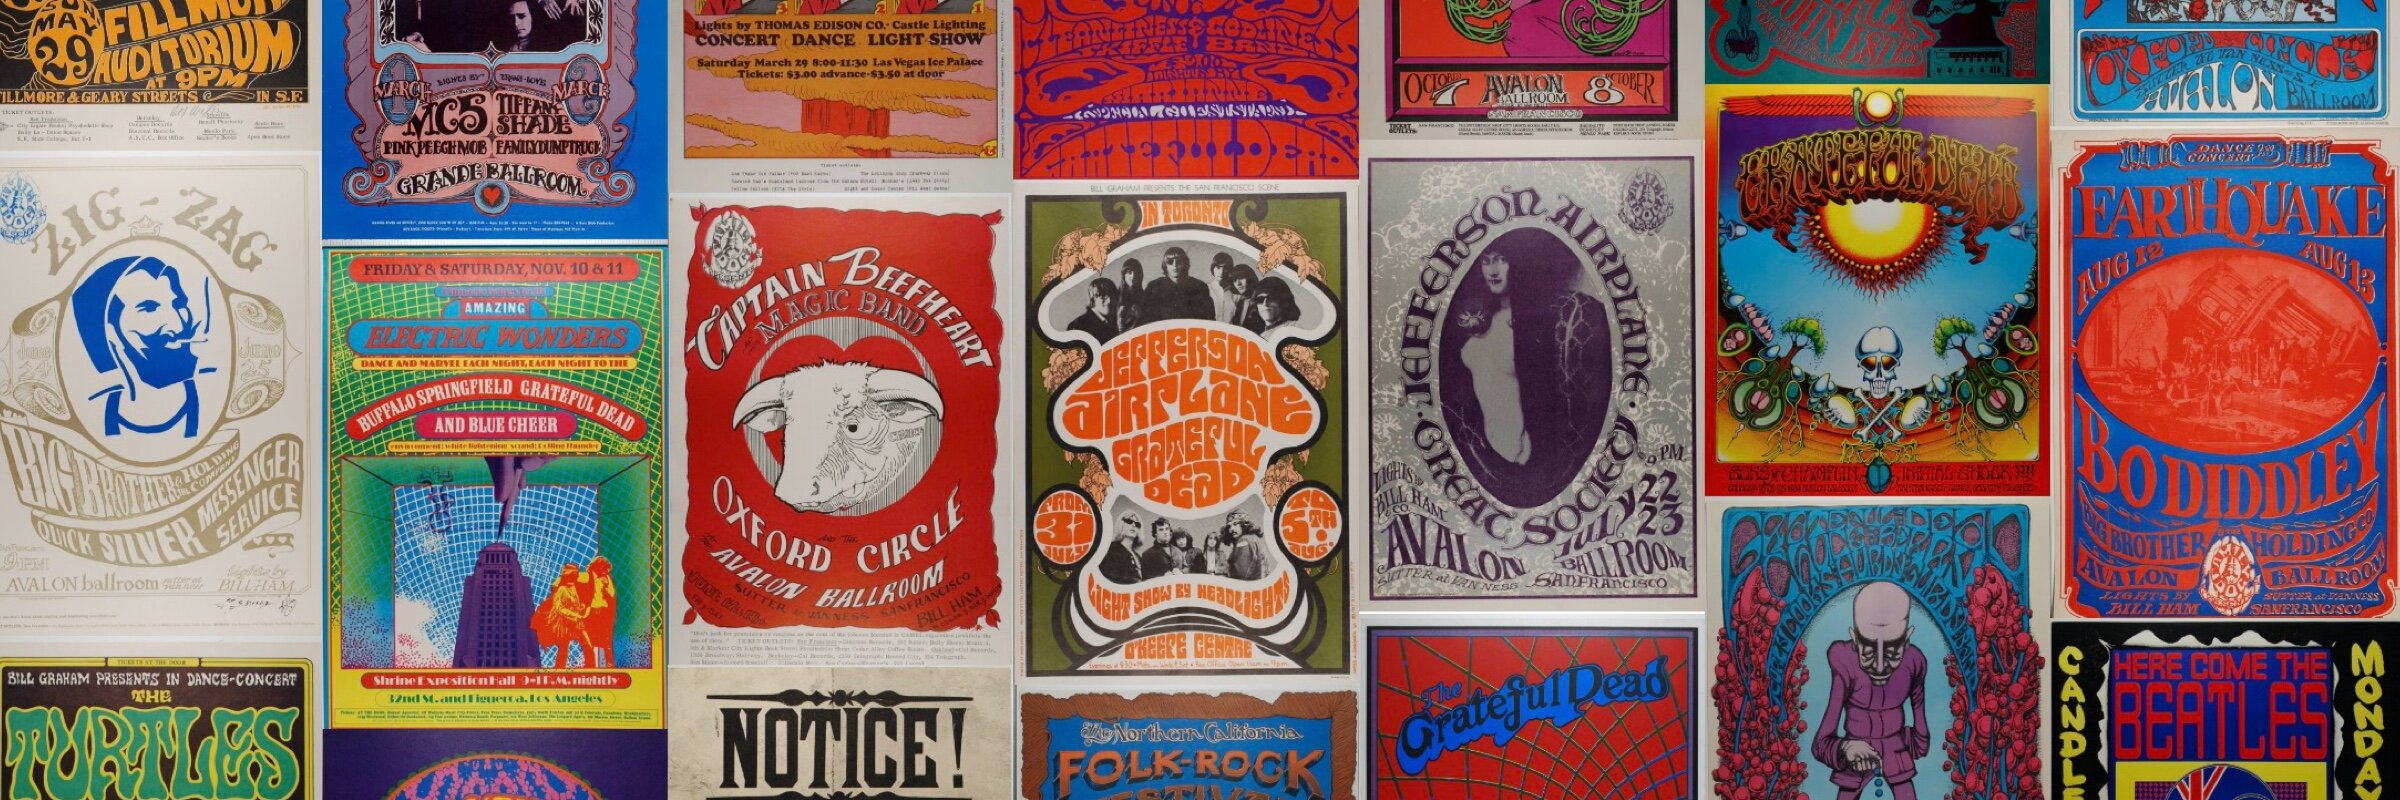 Ultimate Vintage Concert Poster Price GUide -